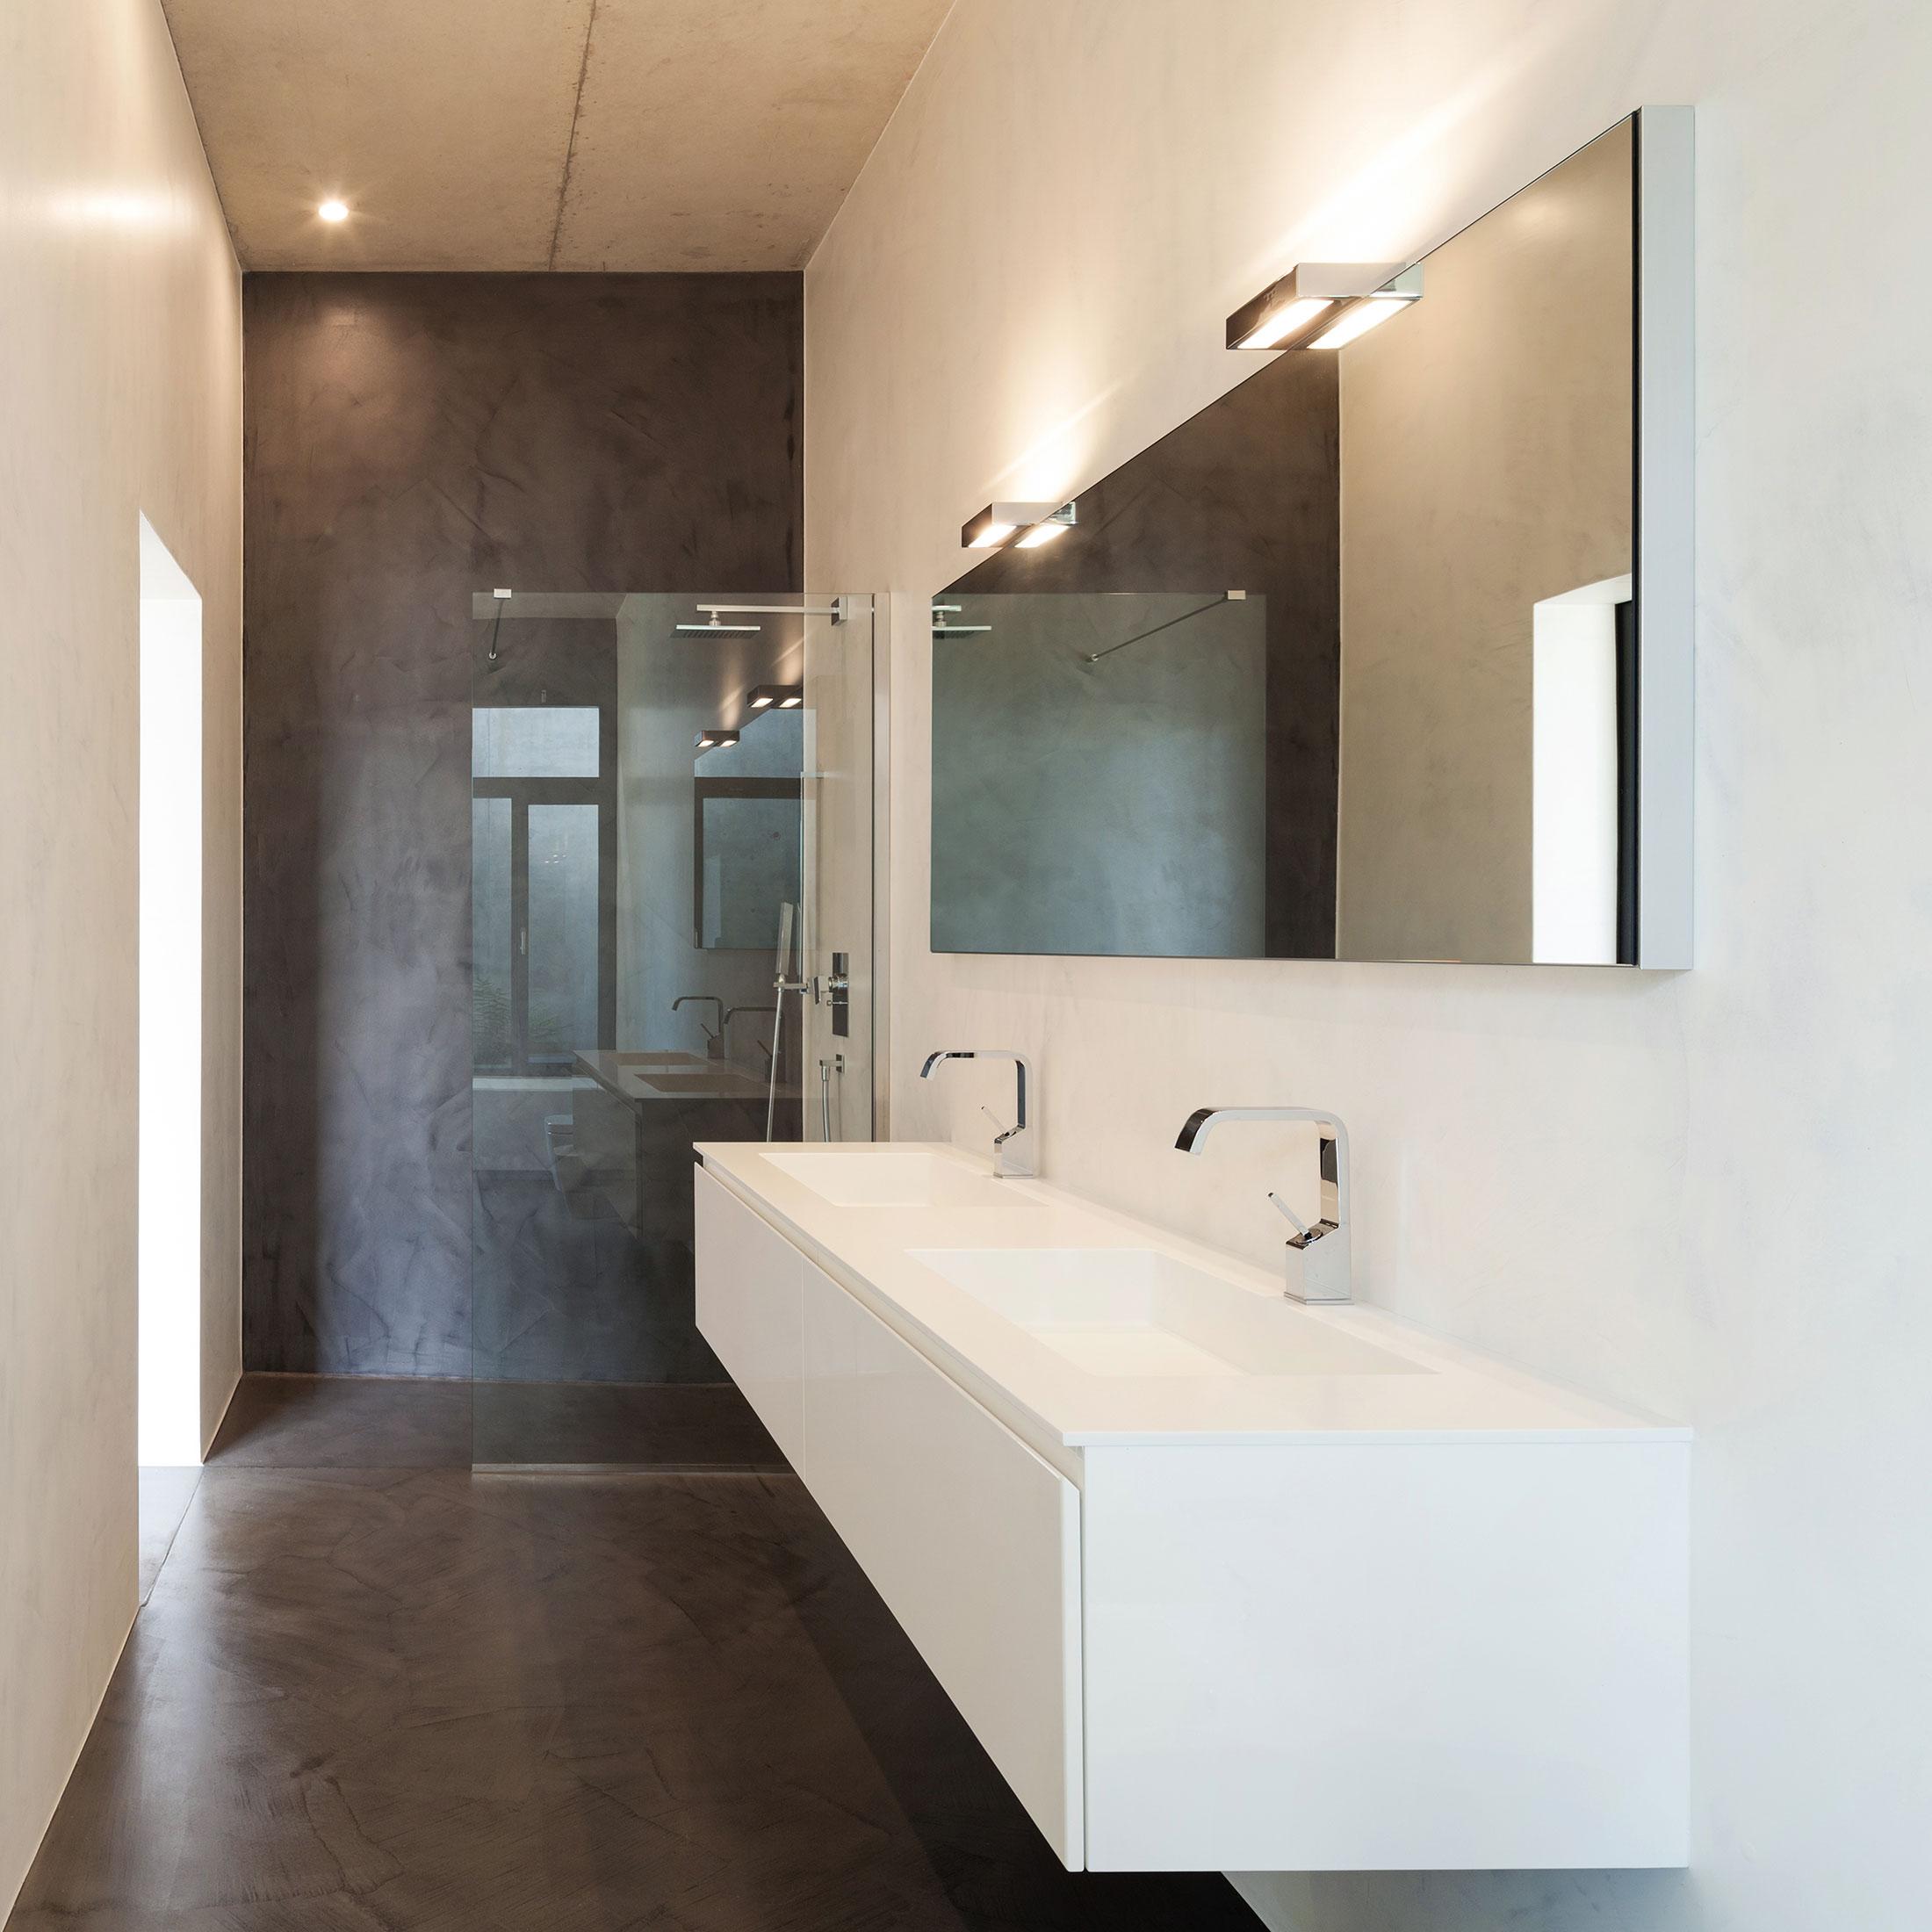 cemento madre bagno errelab. Black Bedroom Furniture Sets. Home Design Ideas